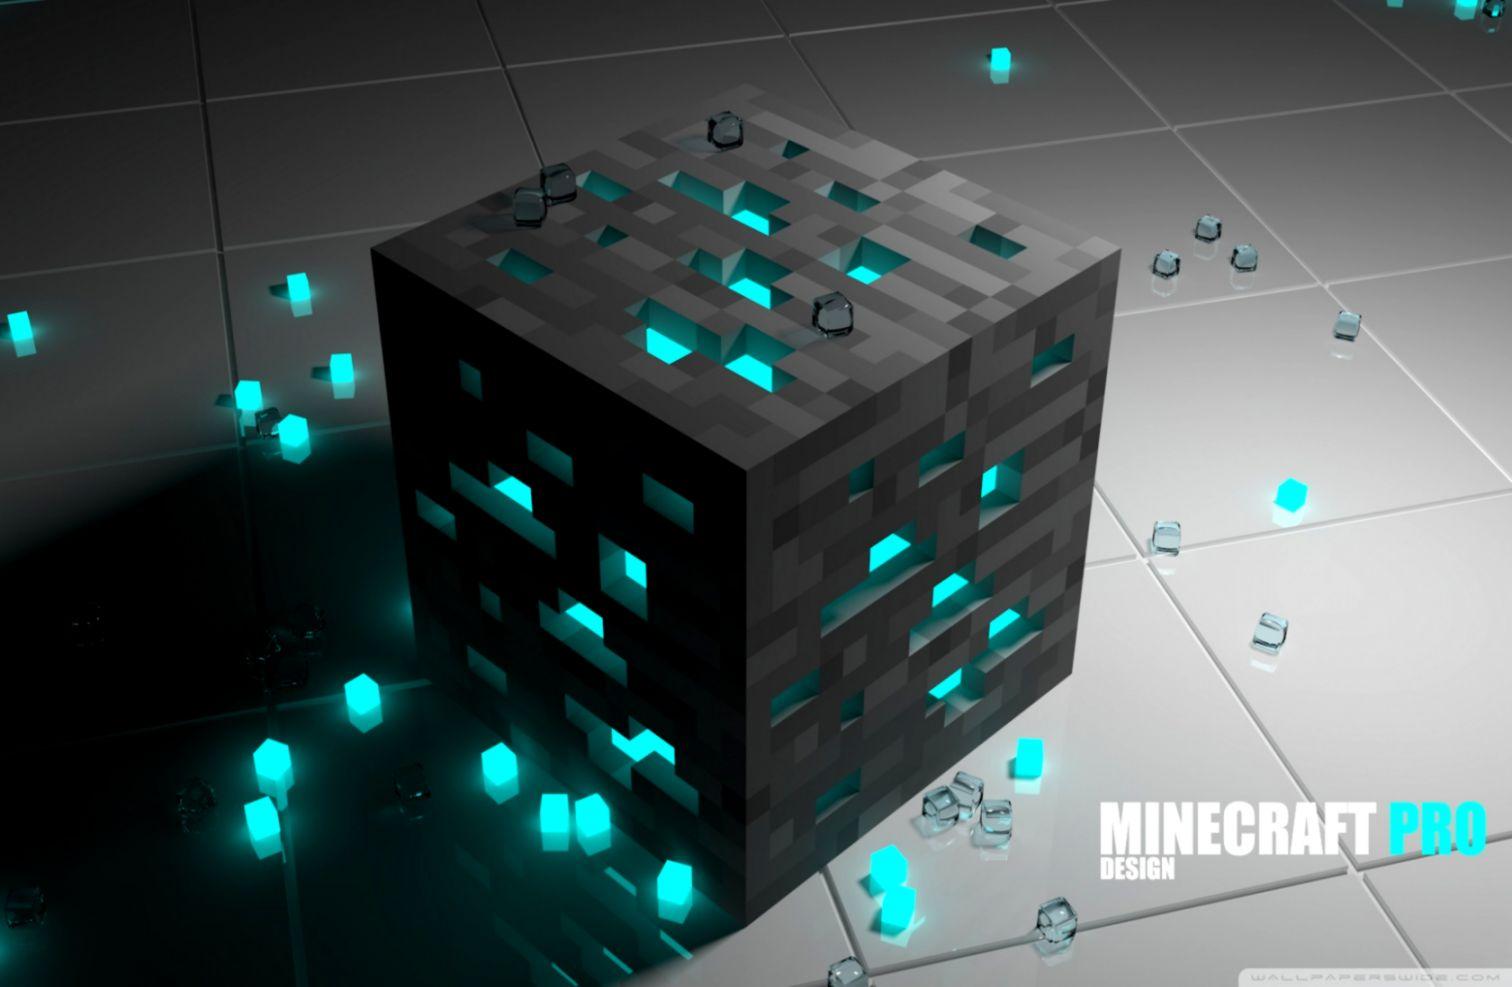 View Minecraft Wallpaper Hd  Gif